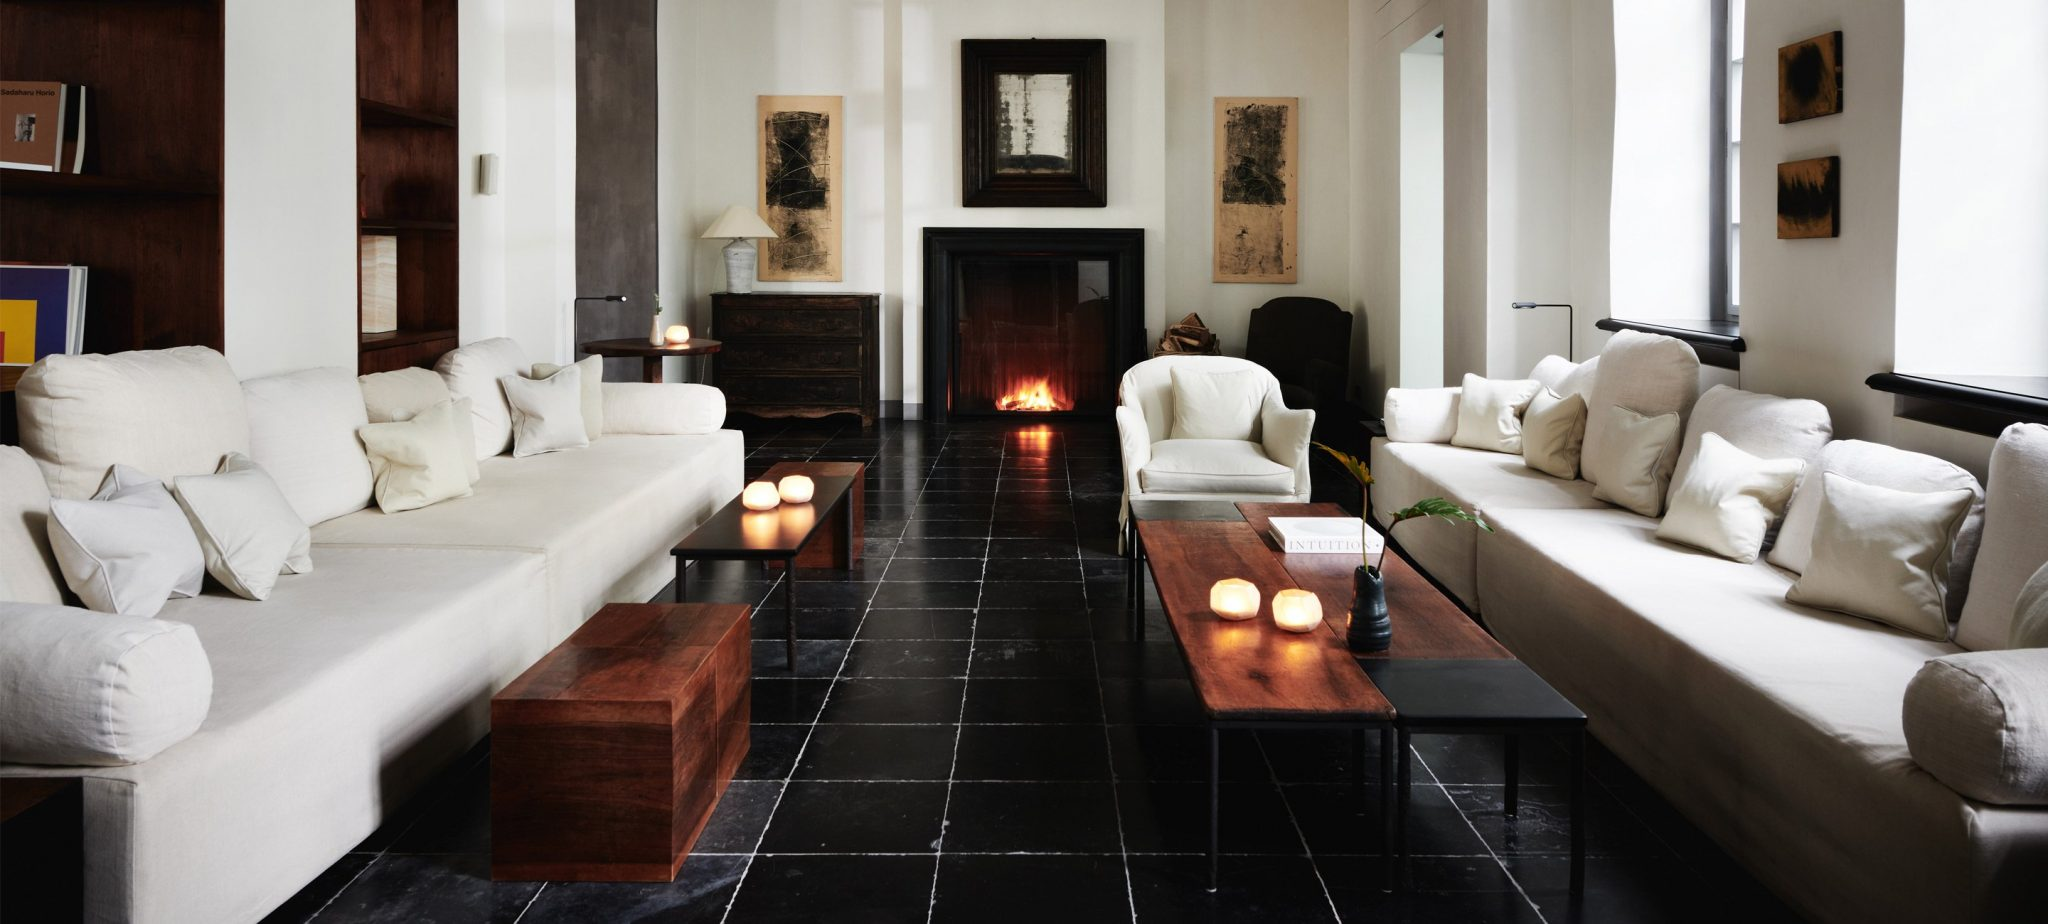 PURS Hotel Andernach